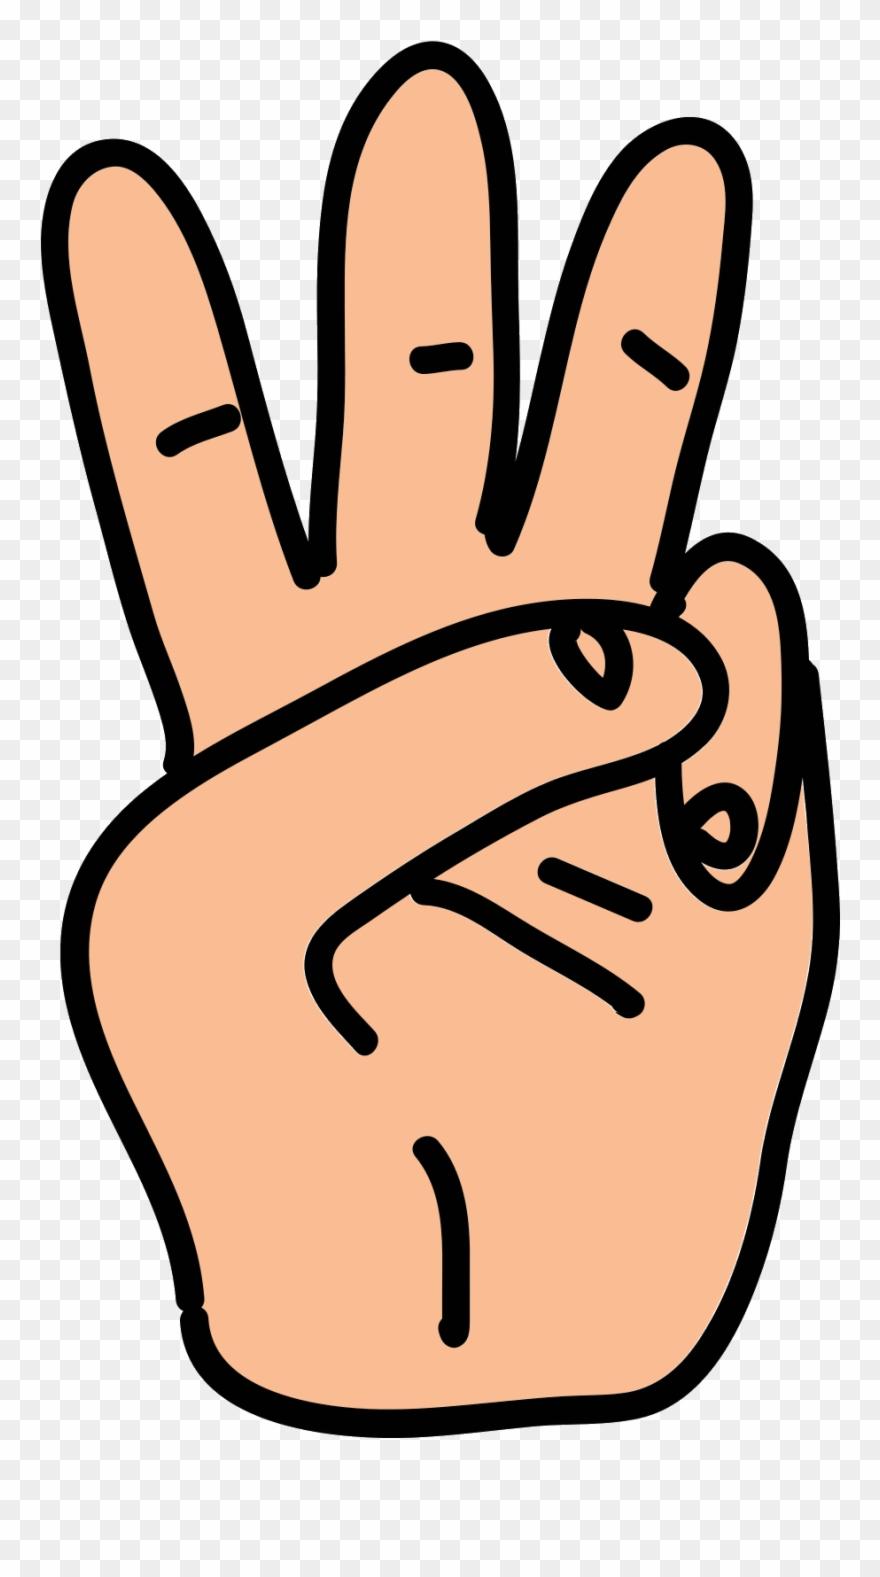 Snap Fingers Clip Art - Three Fingers Clip Art - Png Download ... graphic